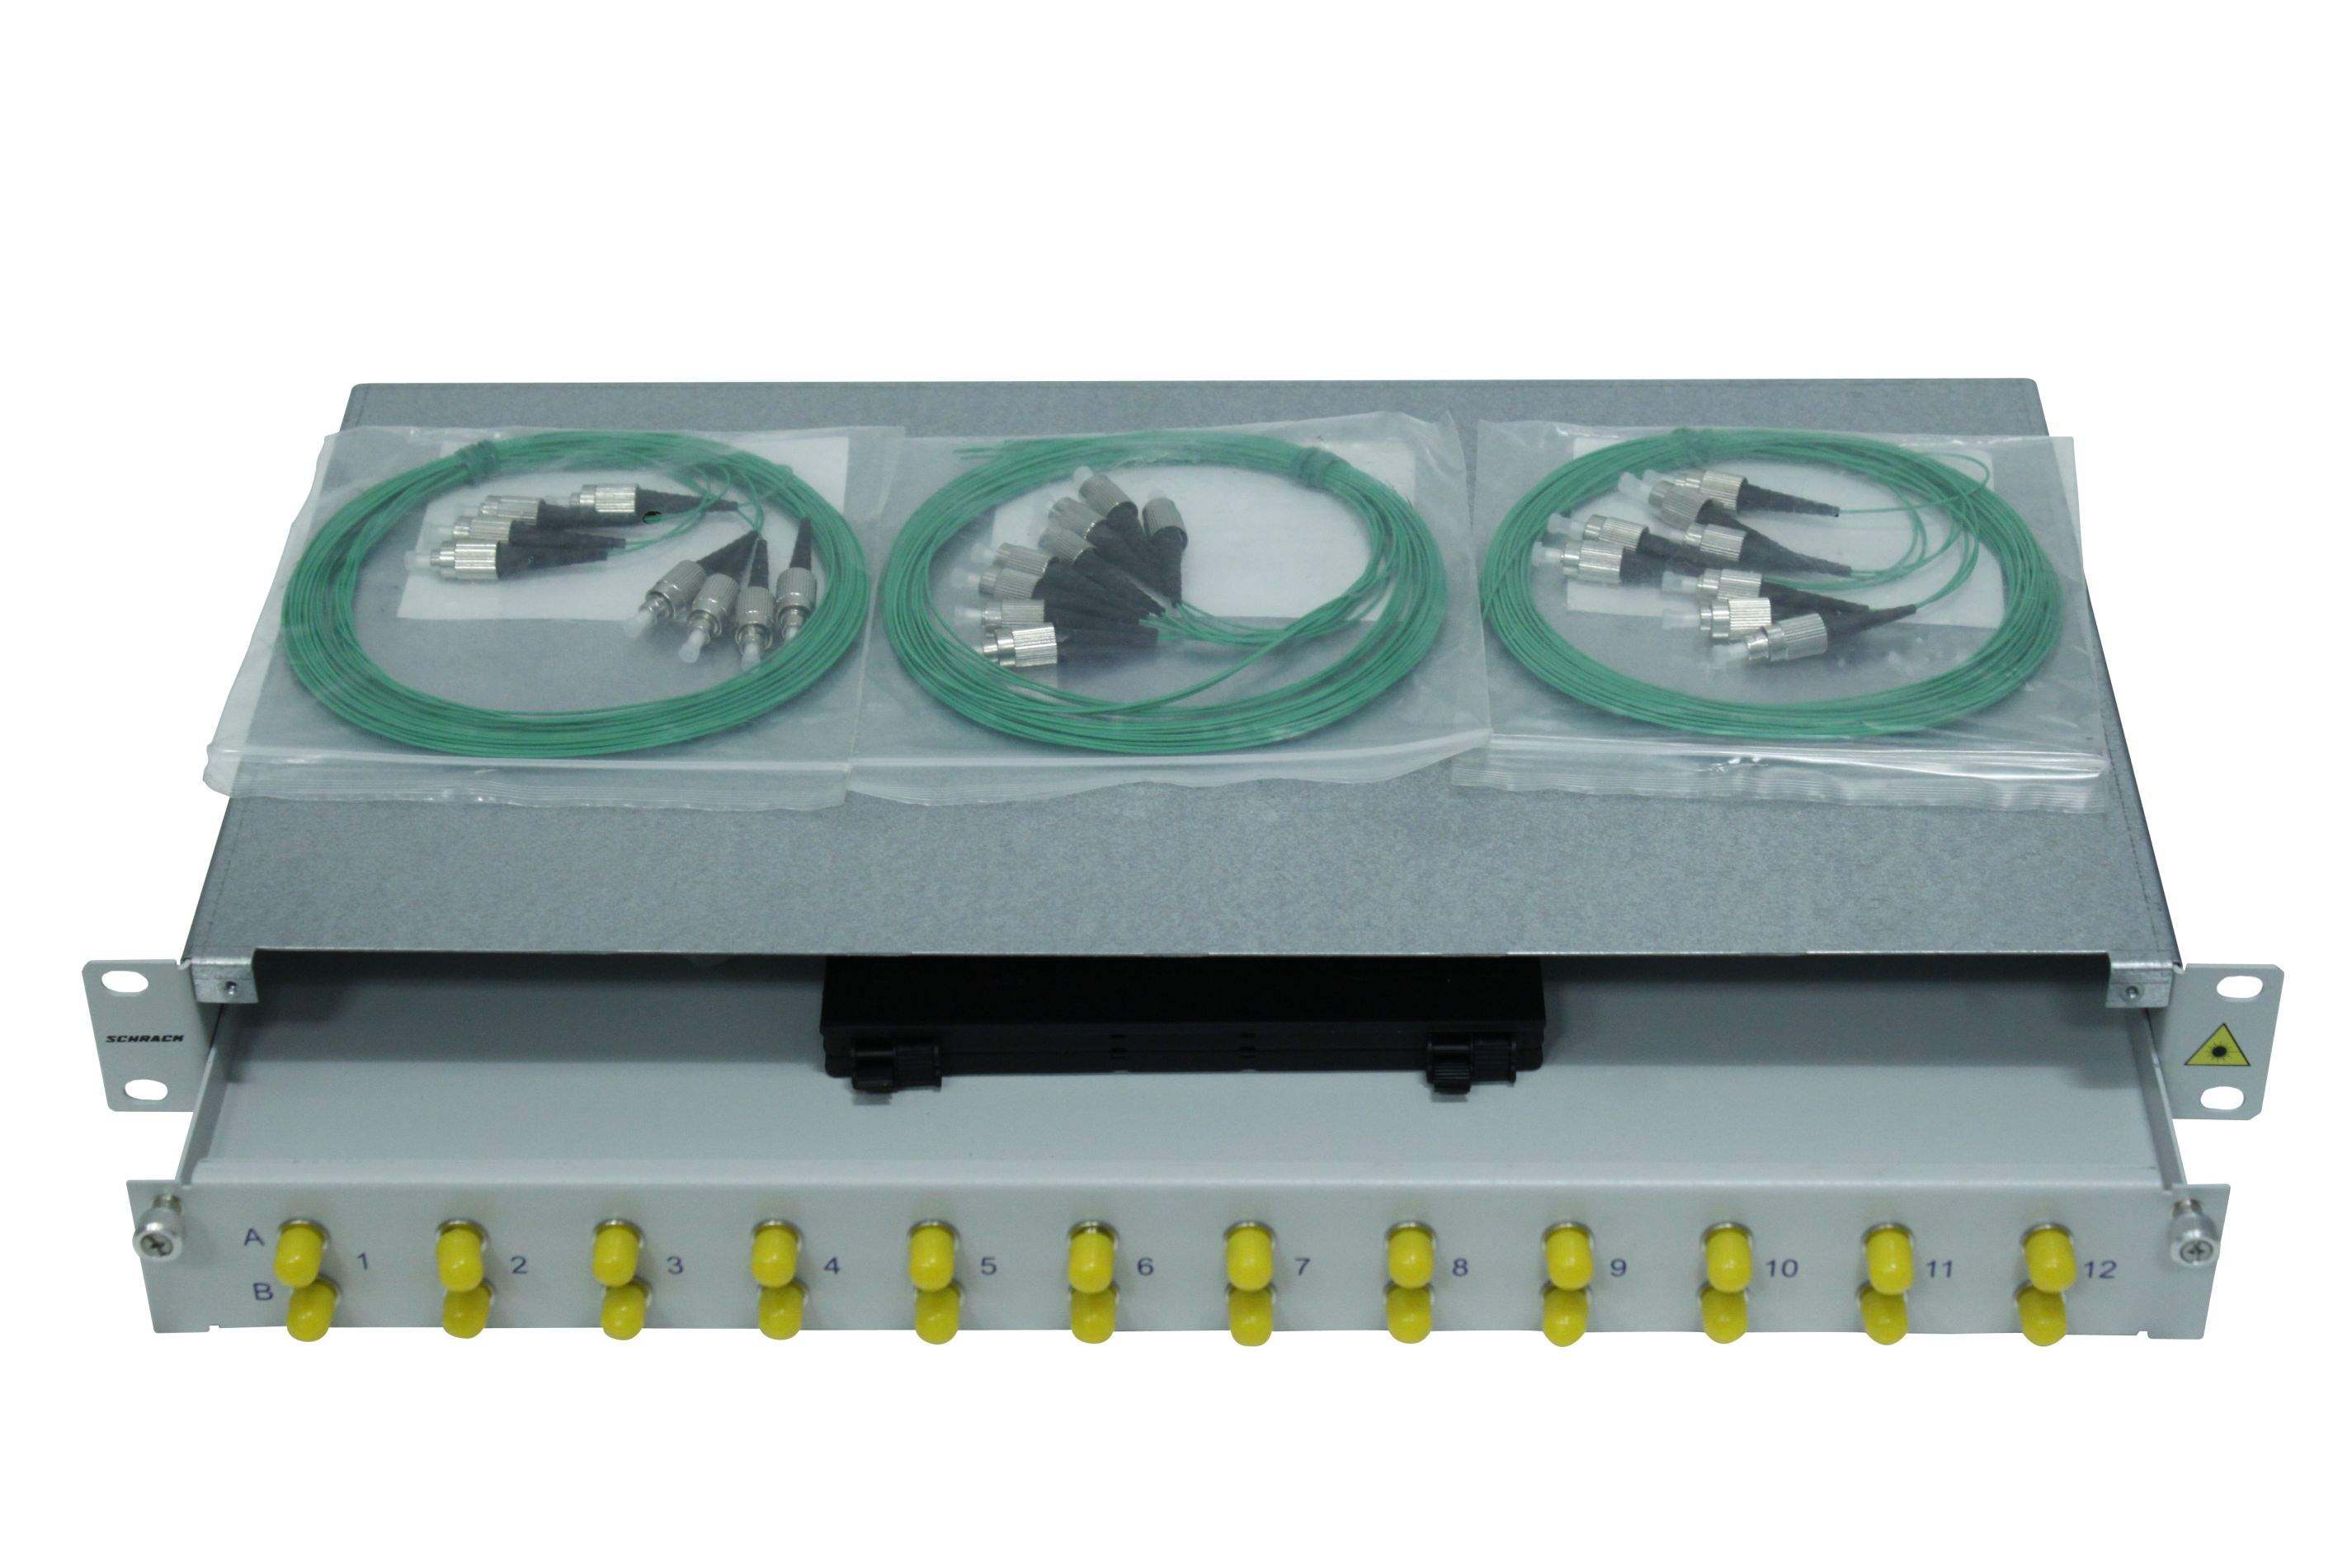 1 Stk LWL Spleißbox, 4Fasern,FC, 9/125µm OS2, ausziehbar,19,1HE HSELS049FG